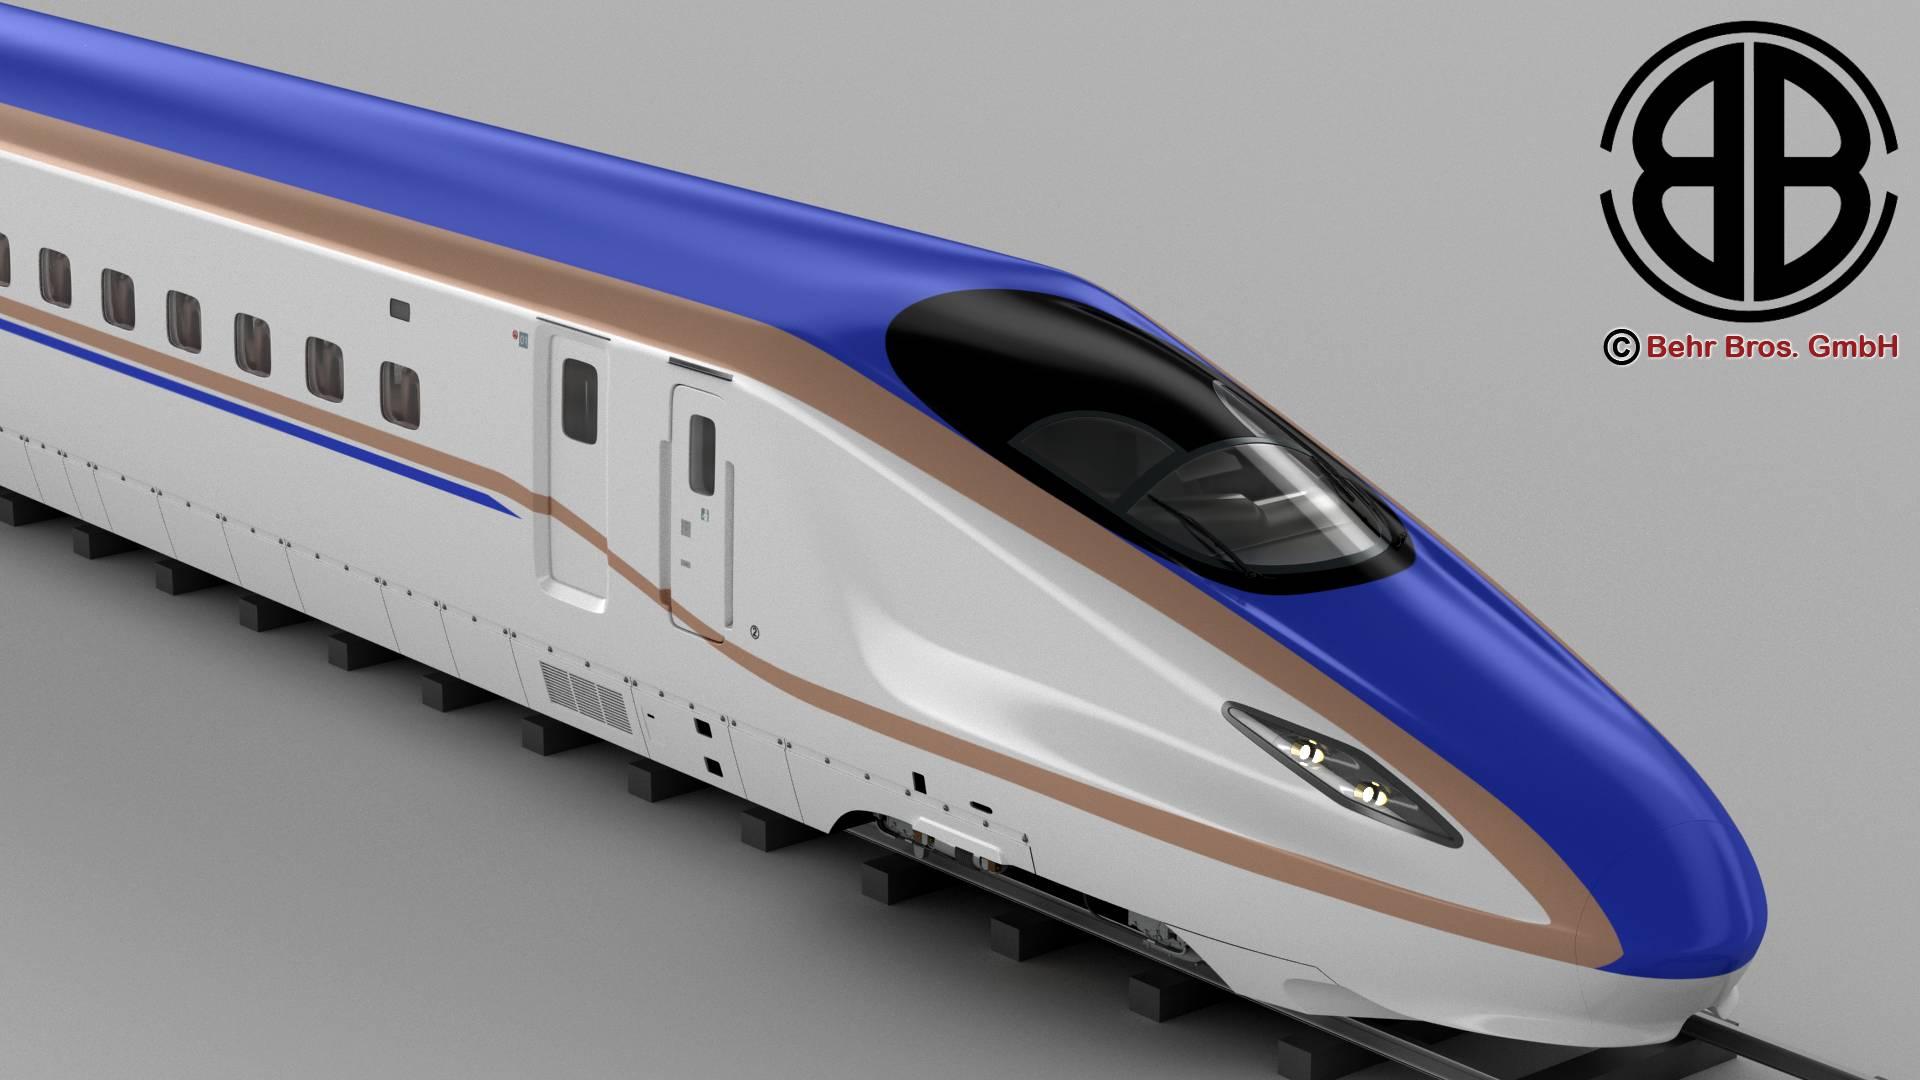 shinkansen e7 3d modelo 3ds max fbx c4d lwo ma mb obj 265649